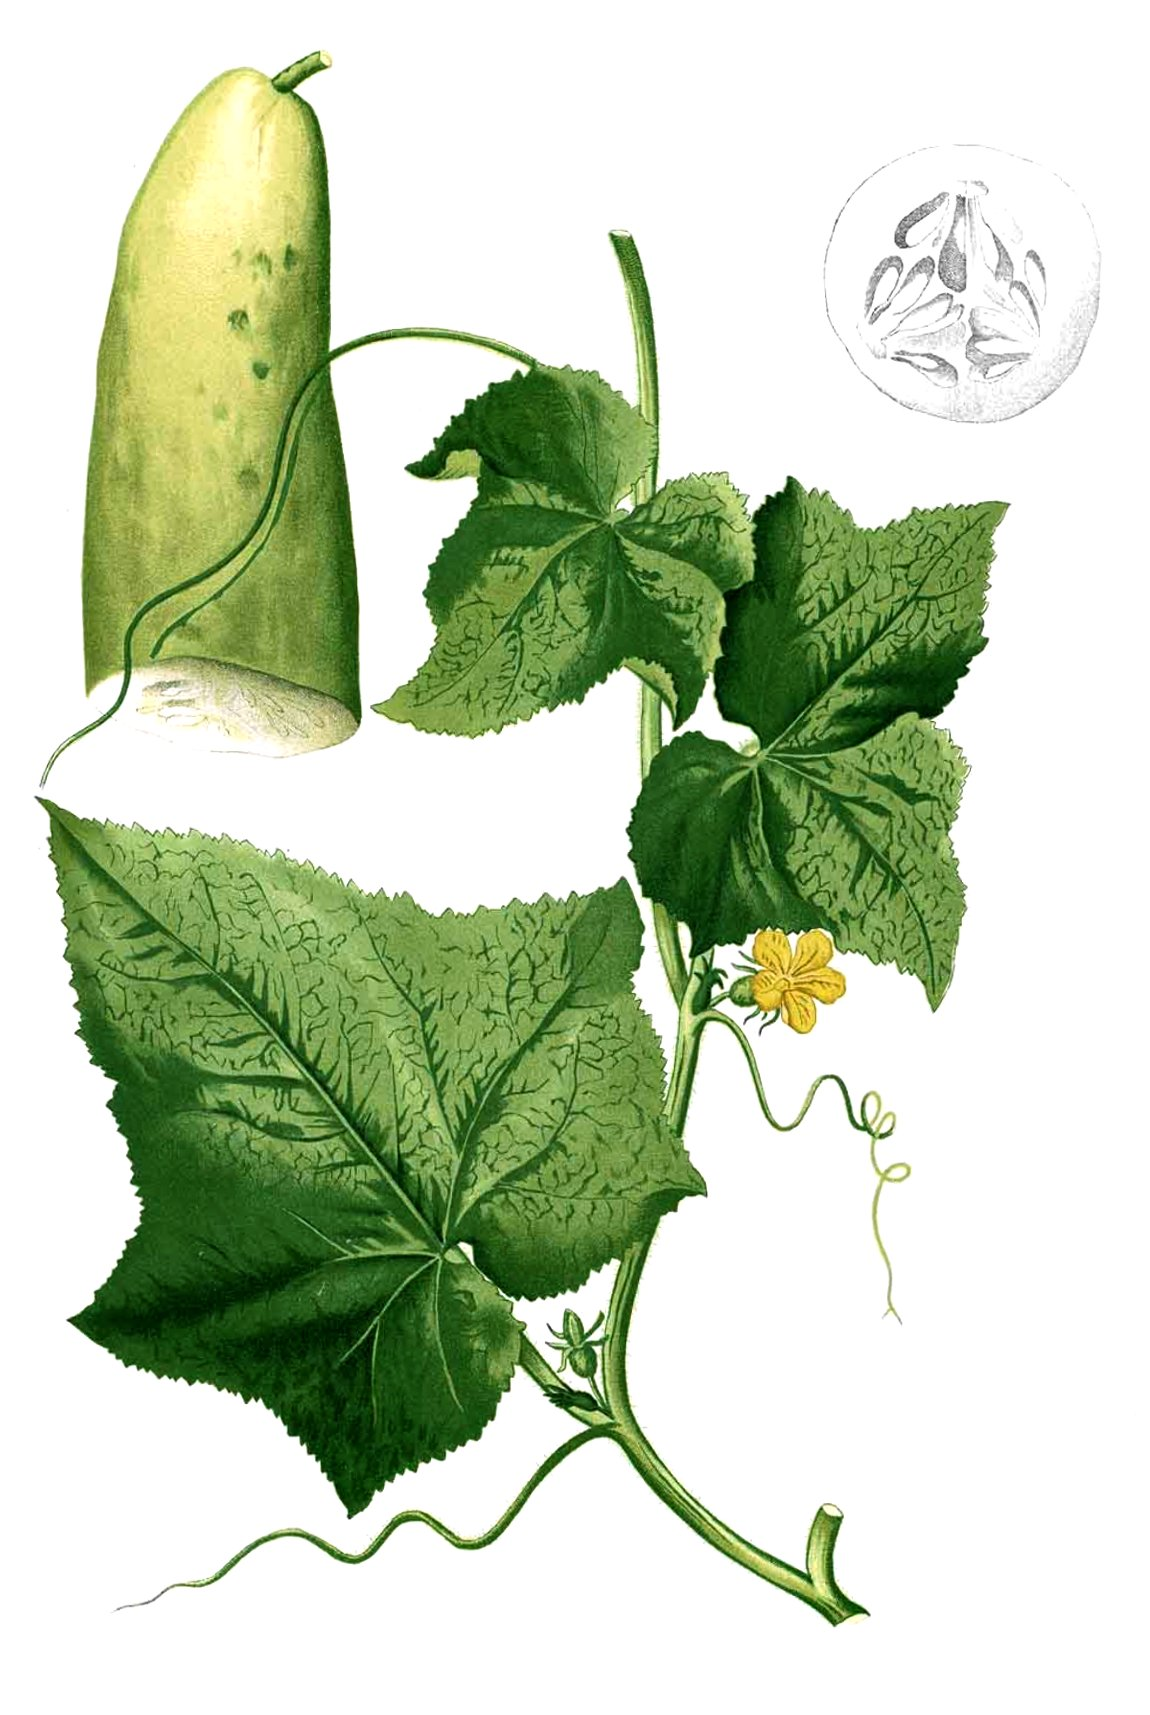 Картинка огурца растения